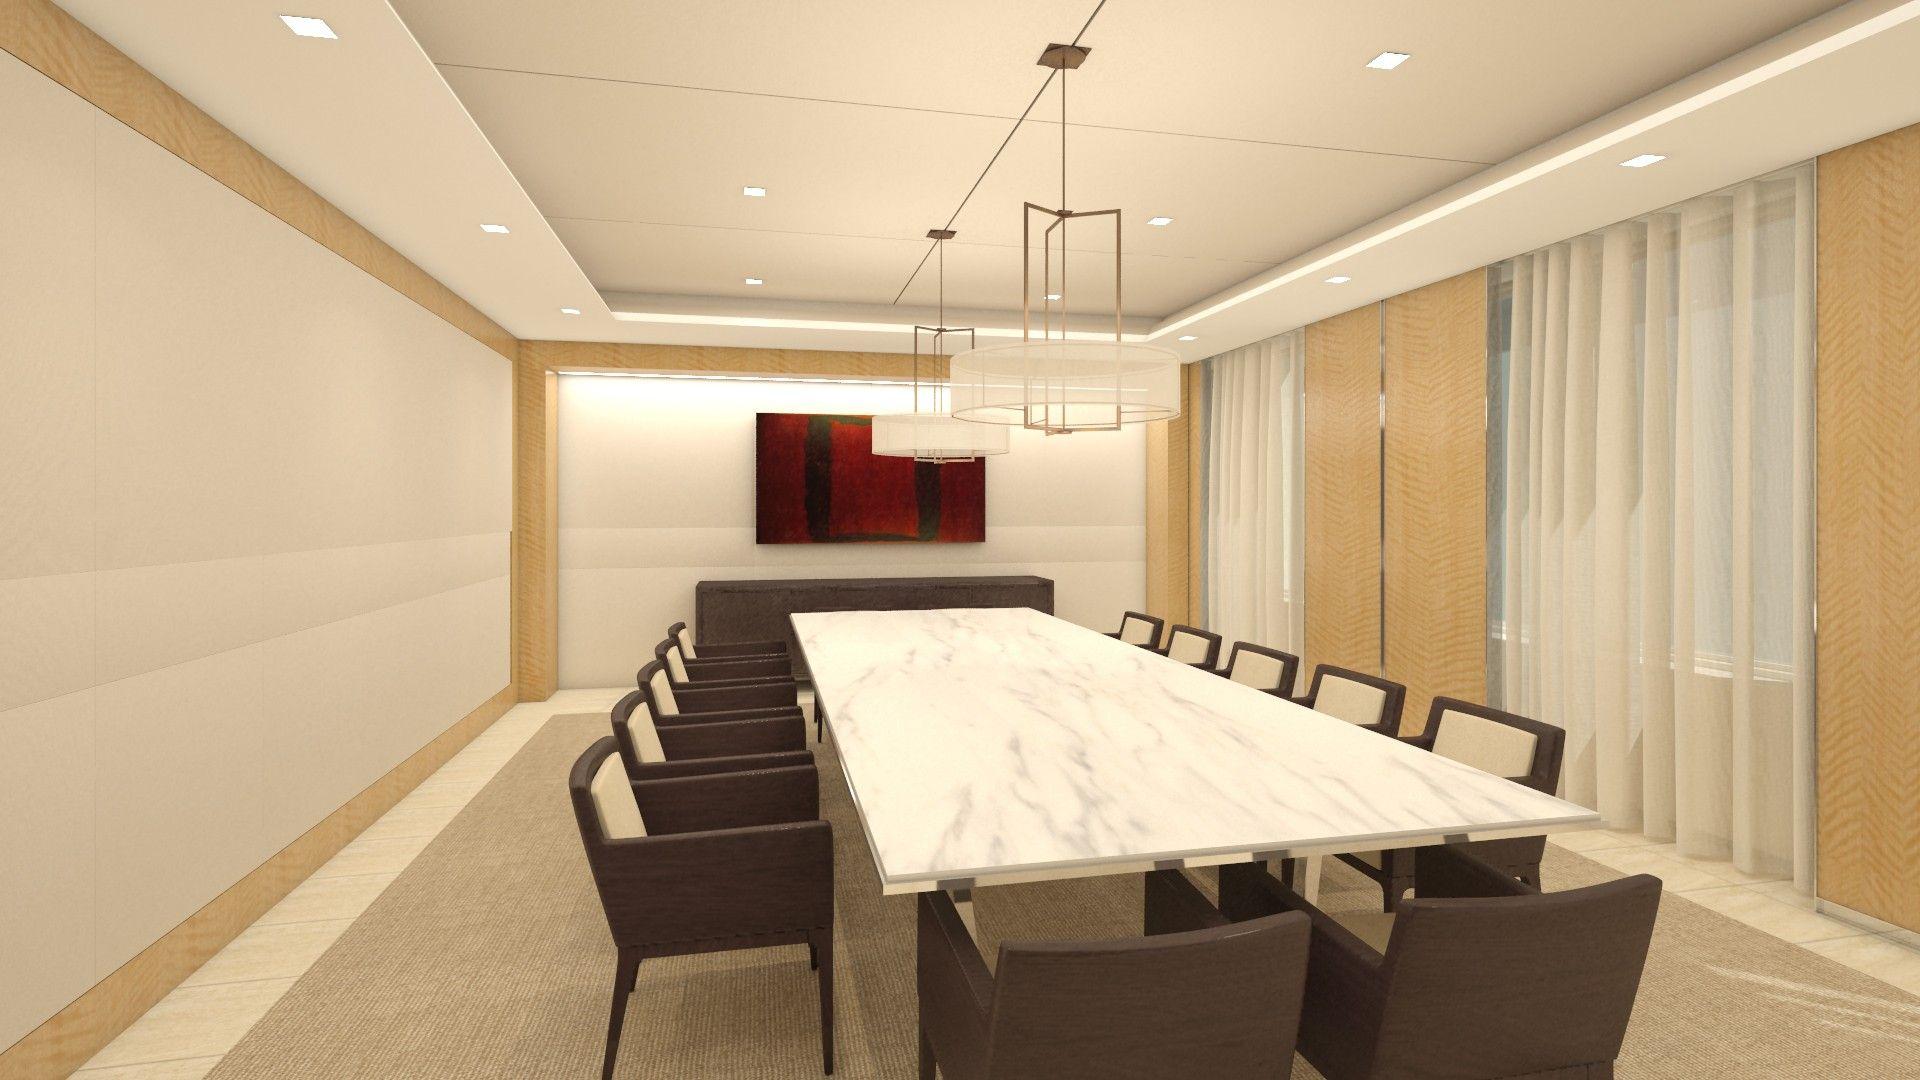 Architectural Photographer | Interior Design Photographer | Photography Of  Architecture And Interiors | Luxury Real Estate Photography | Casa |  Pinterest ...